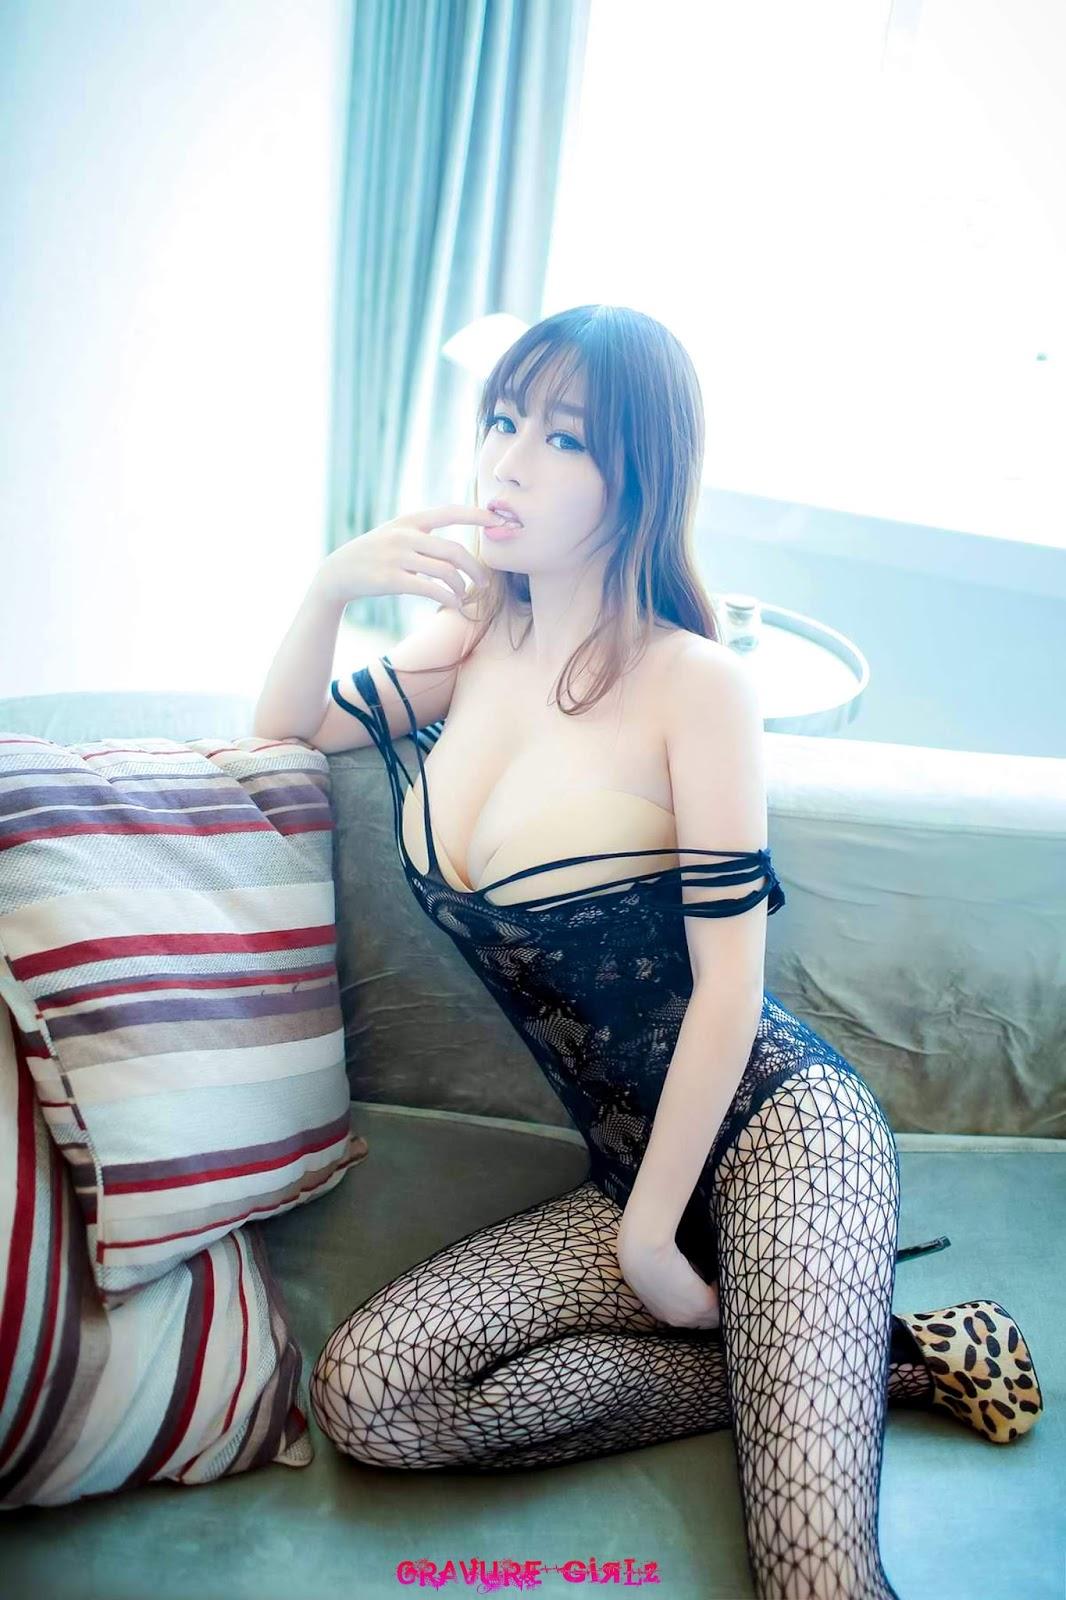 Lsp nude 2 lsp nude girl Phimvu Blog: [tuigirl] Wang Yu Chun 王語純 Huge Boobs Chinese